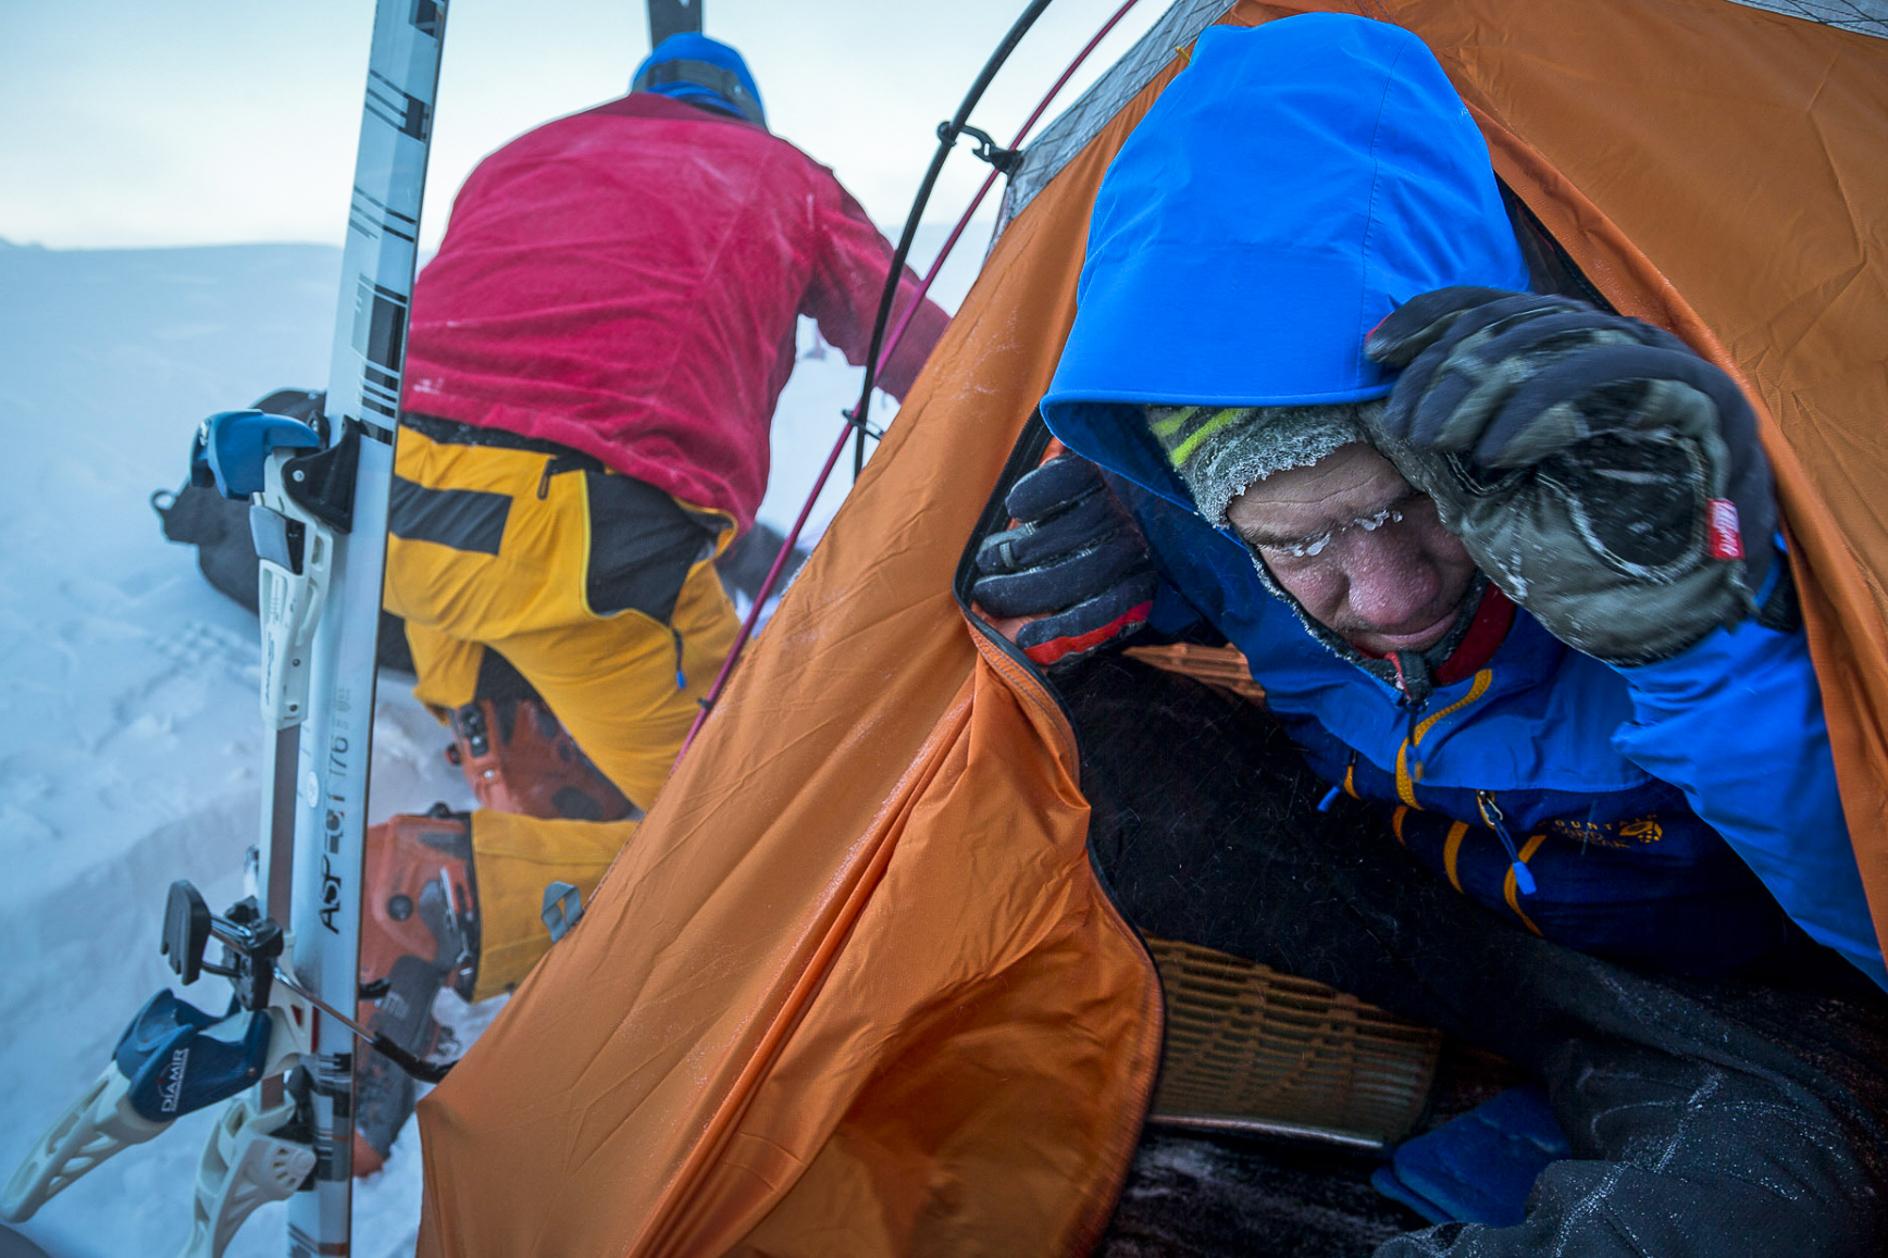 Cory-Richards-Photographer-Antarctica-2.jpg